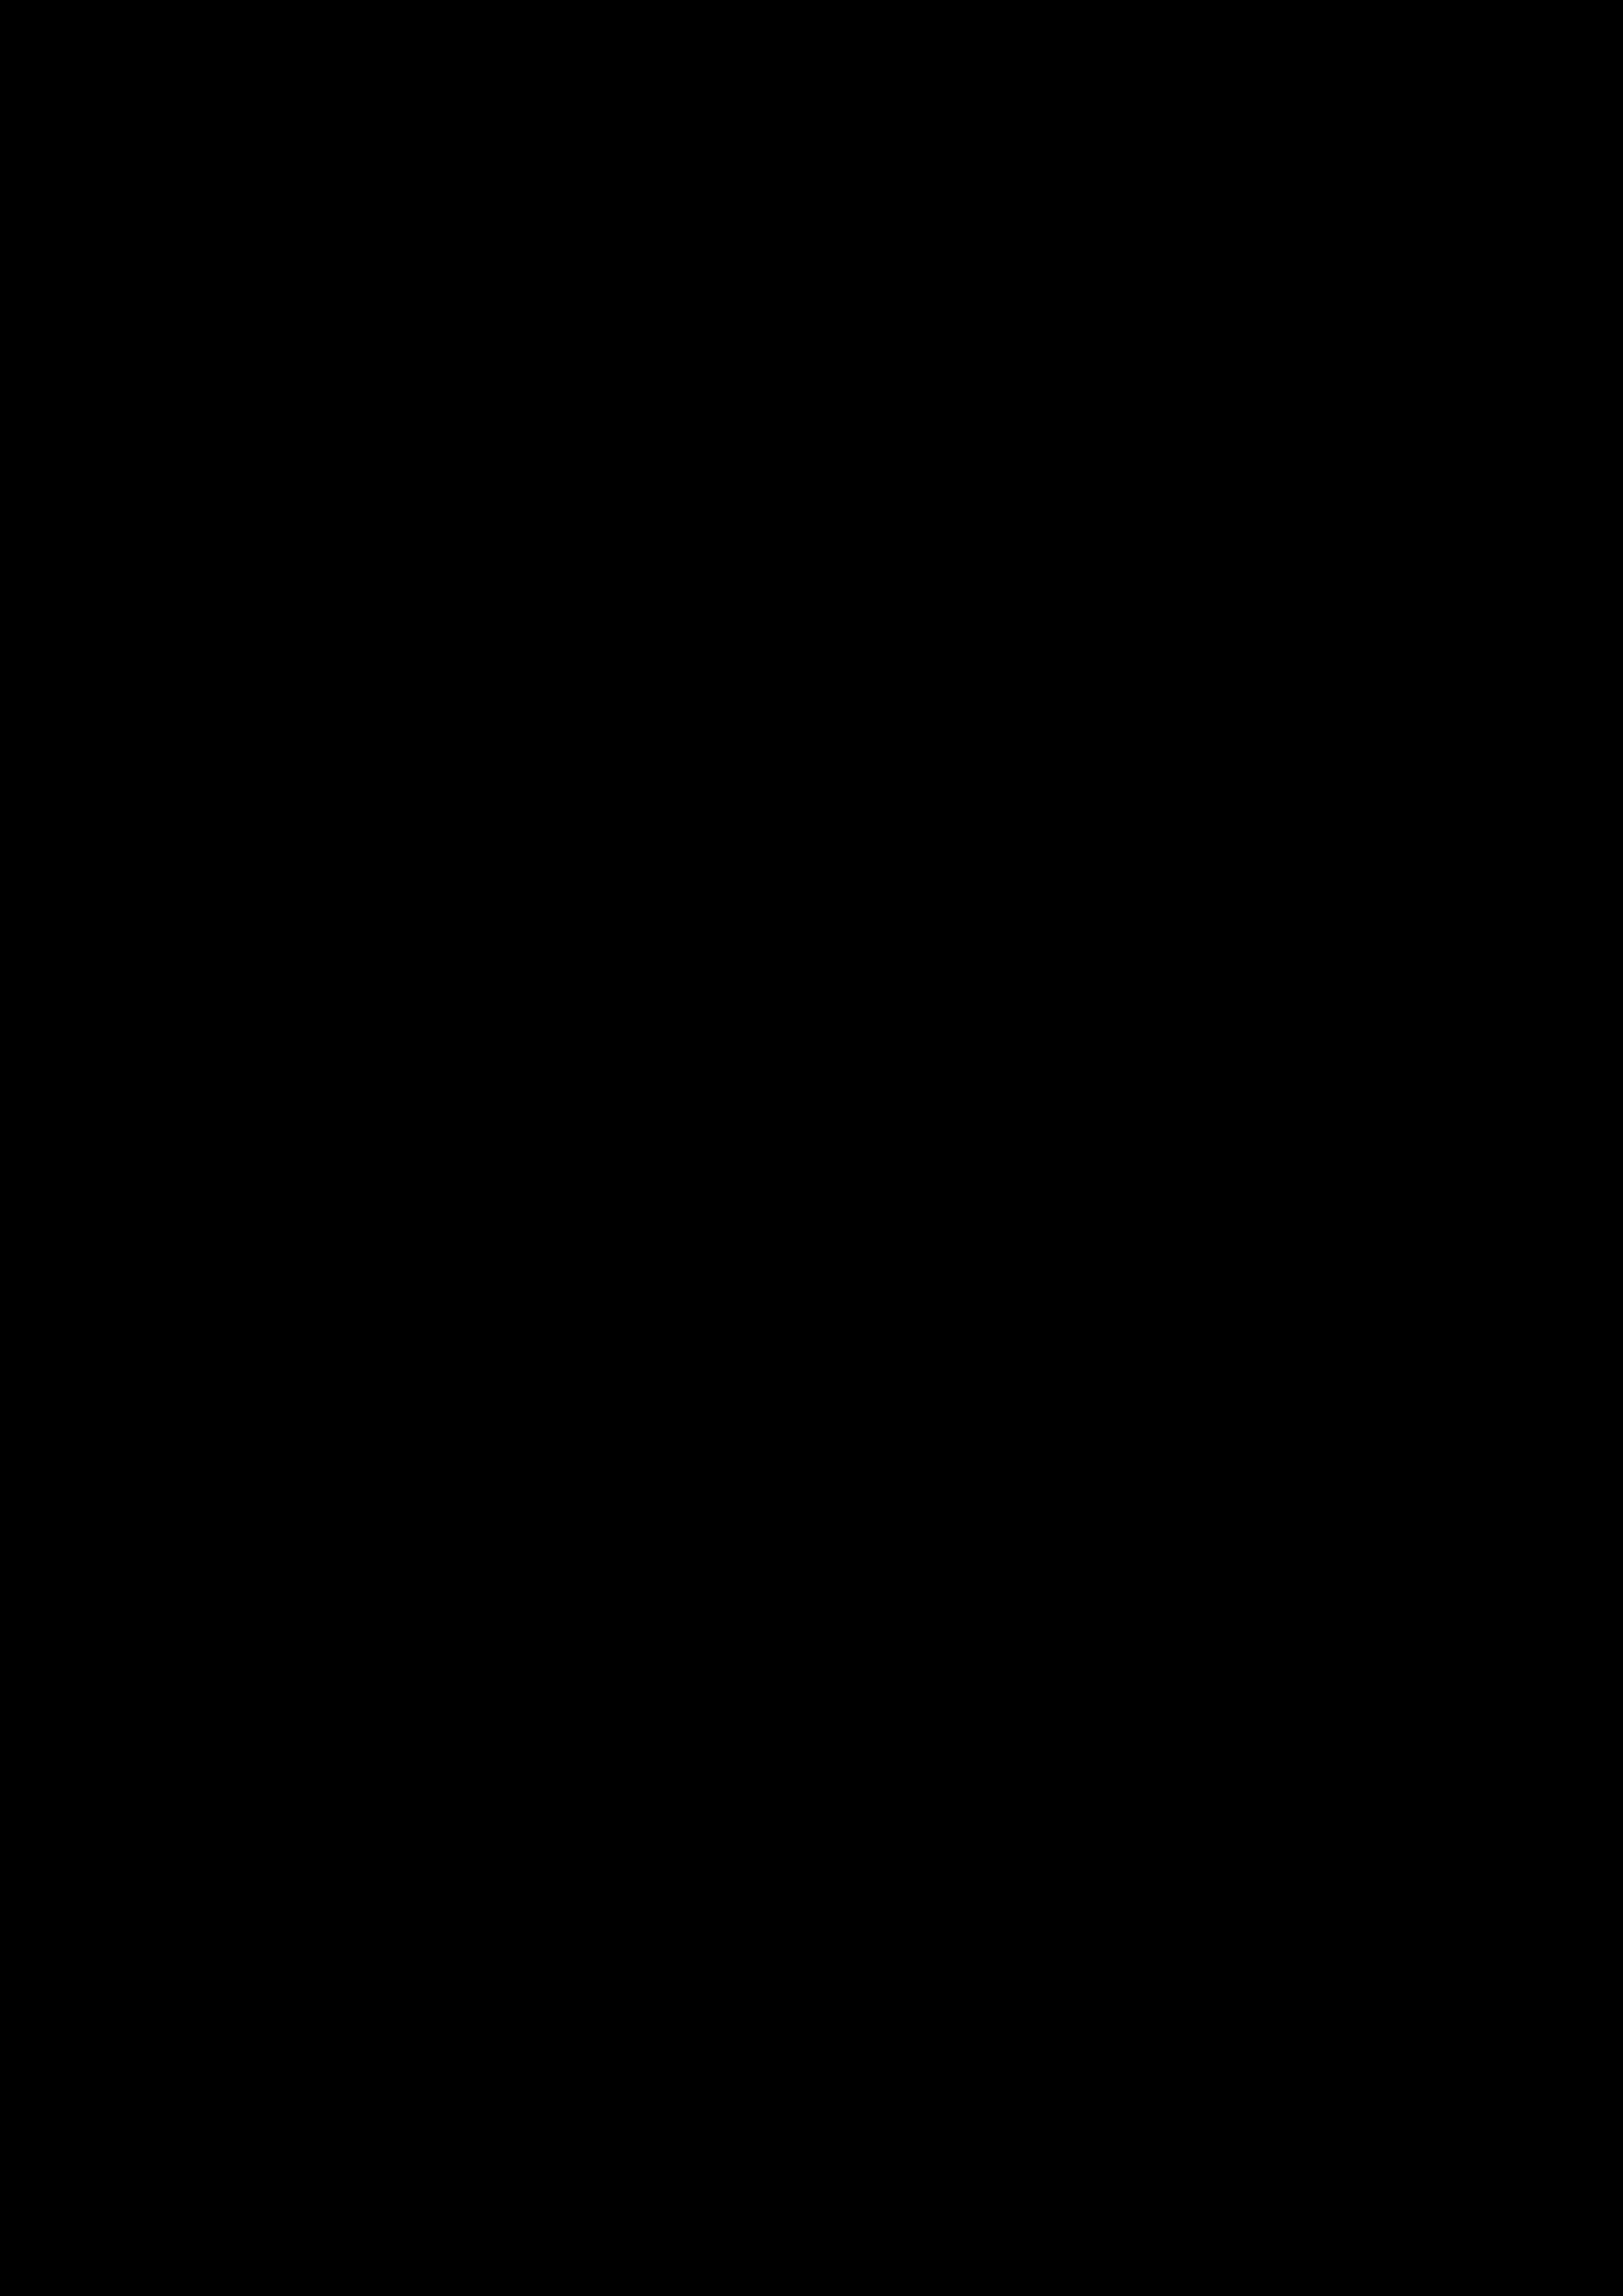 BIG IMAGE (PNG) - Ibex PNG